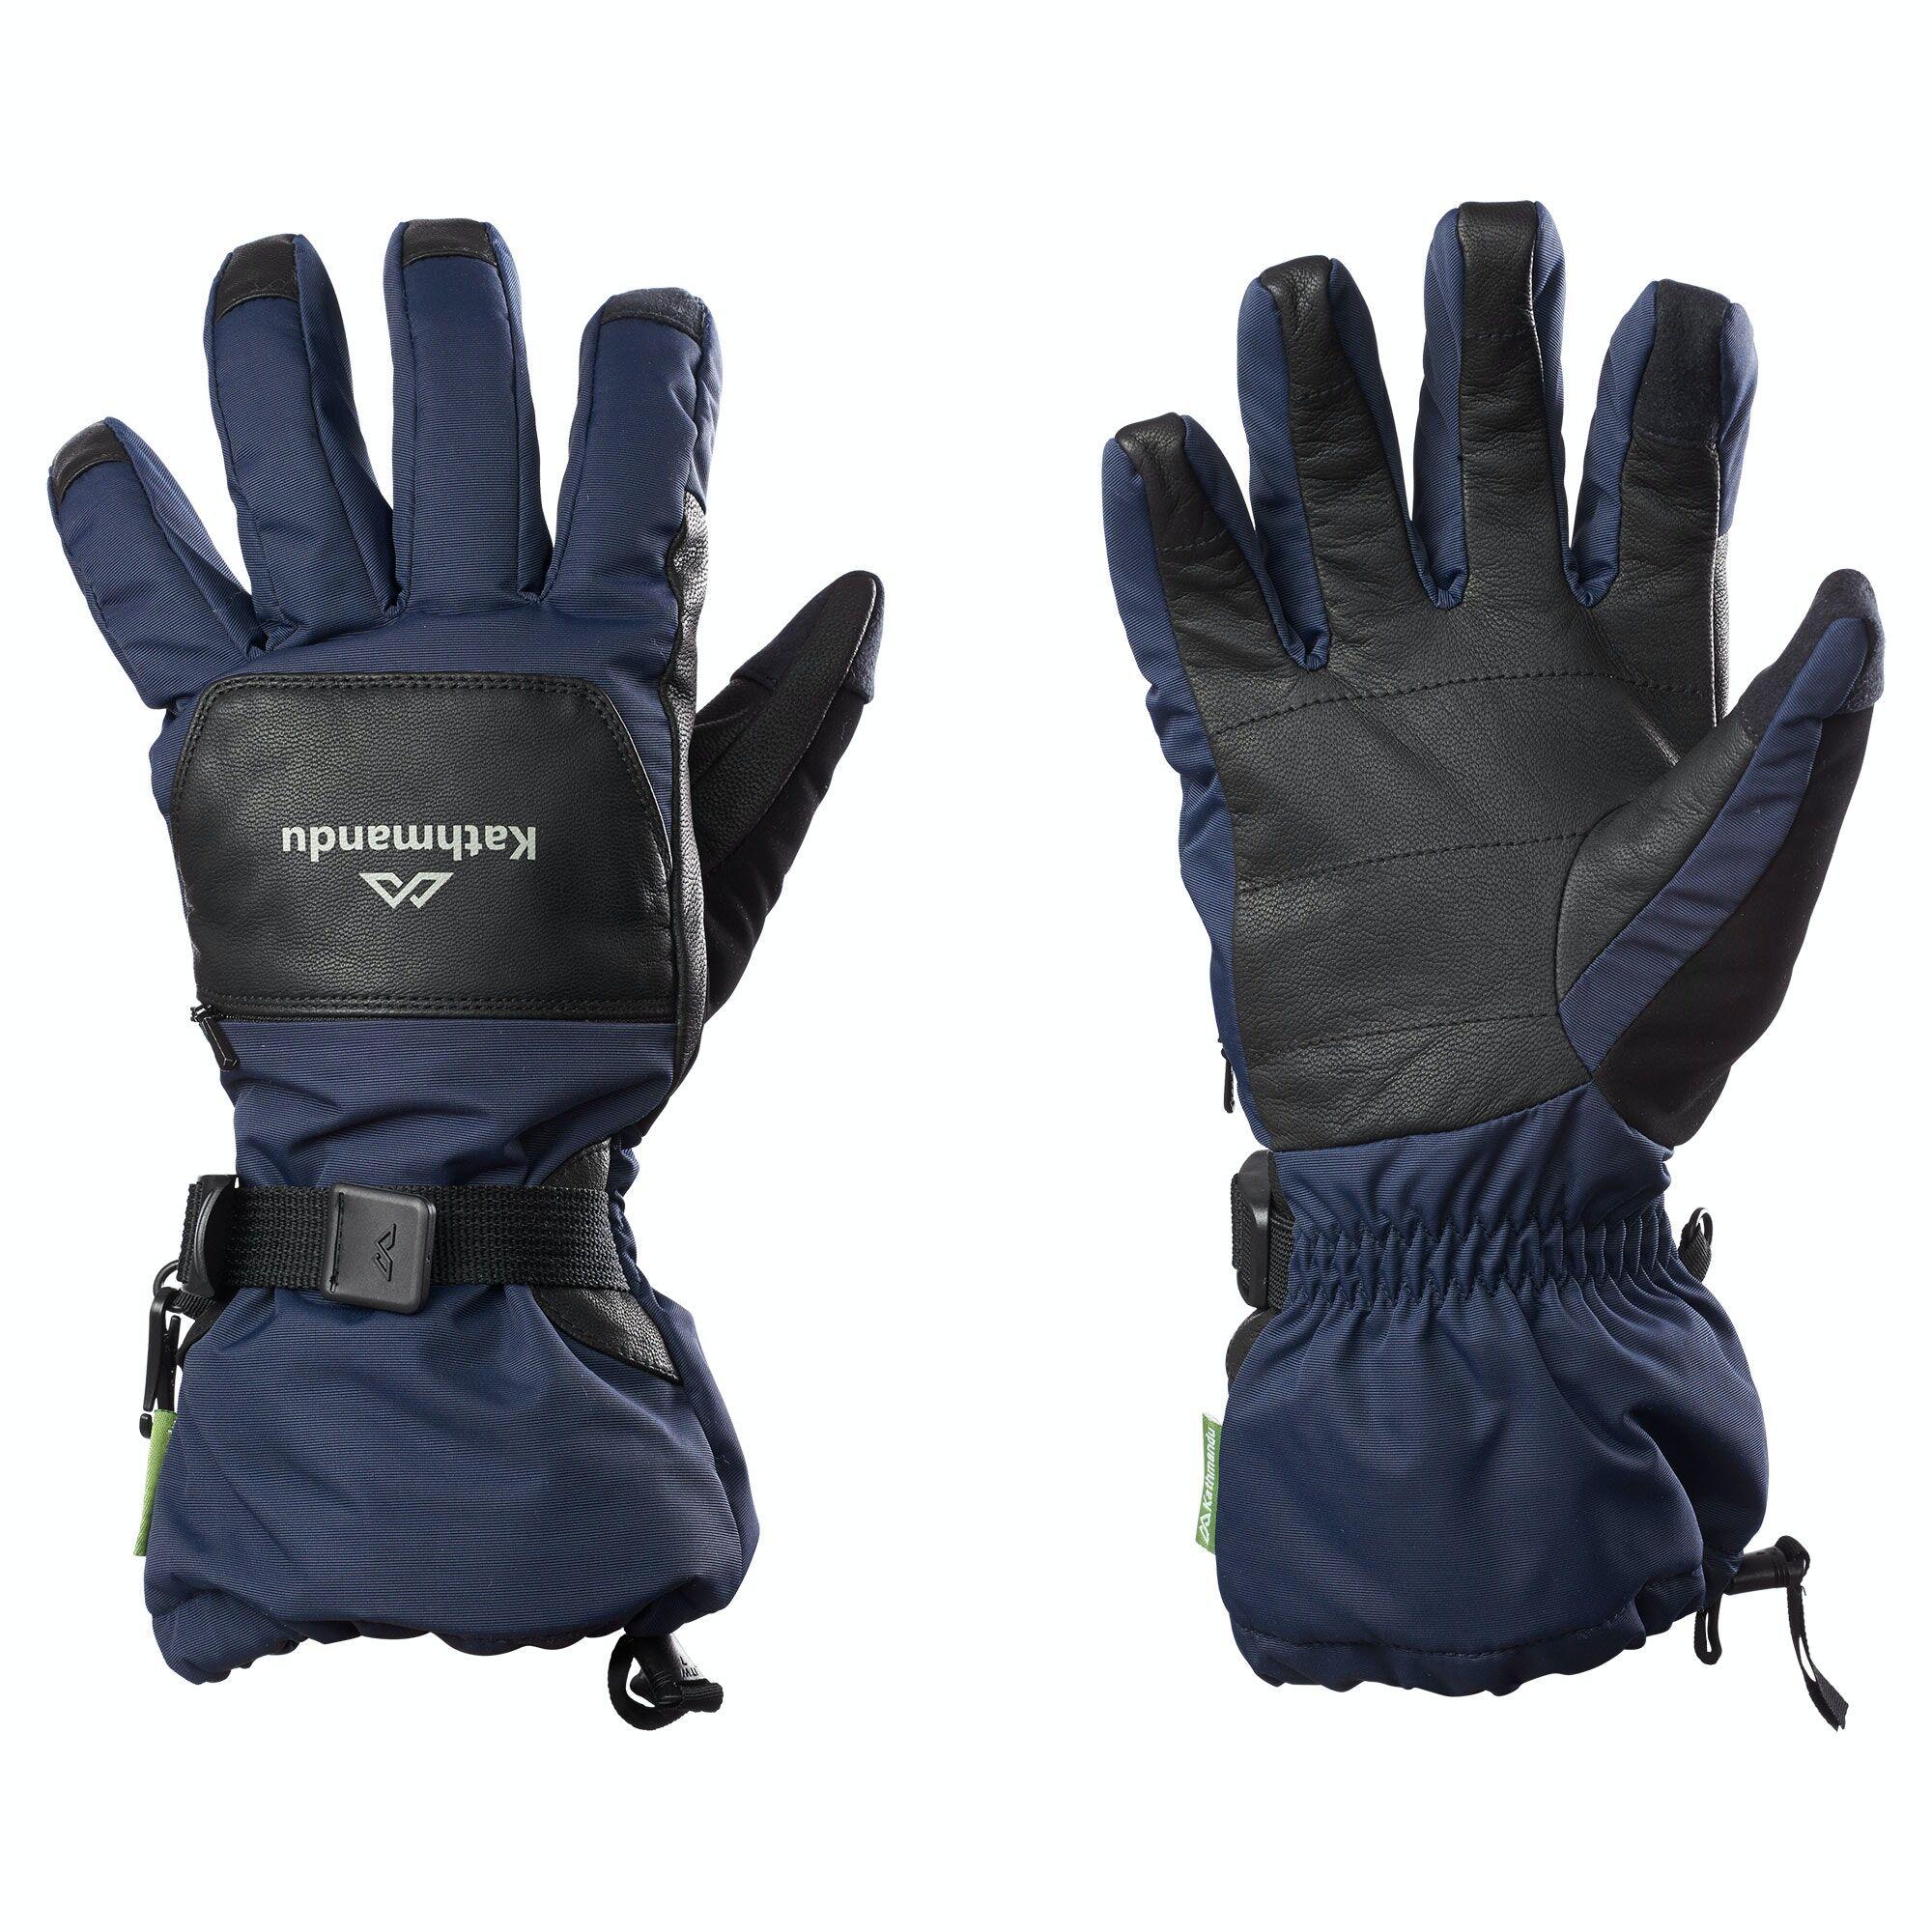 Kathmandu Snow Sports Gloves  - Dark Navy - Size: Medium